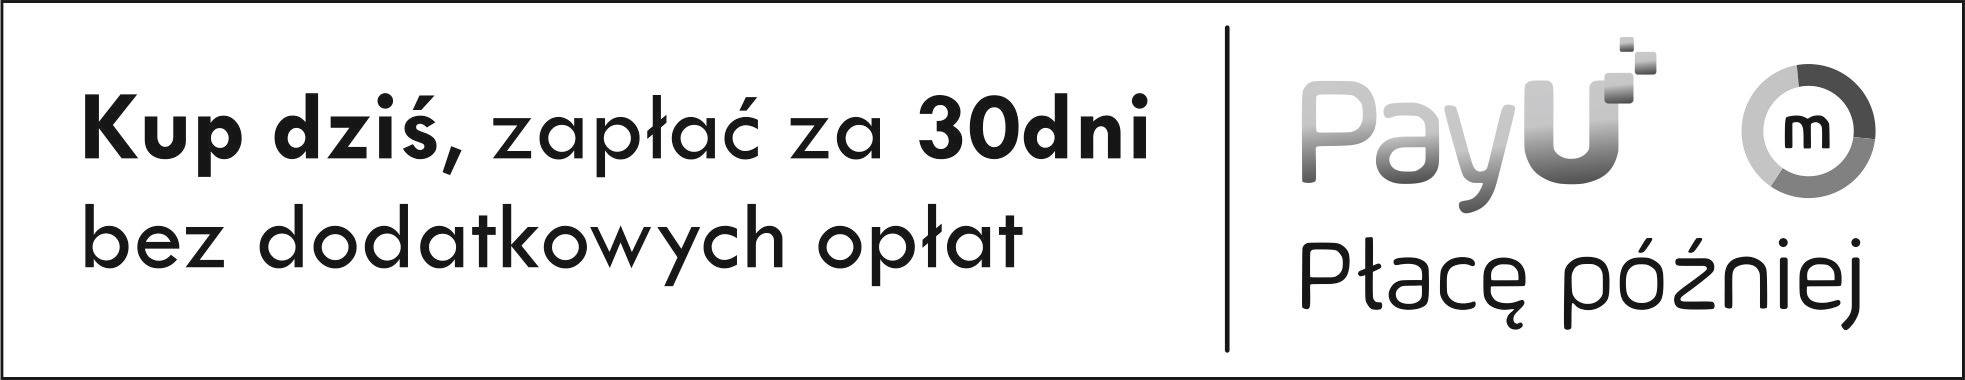 payu banner